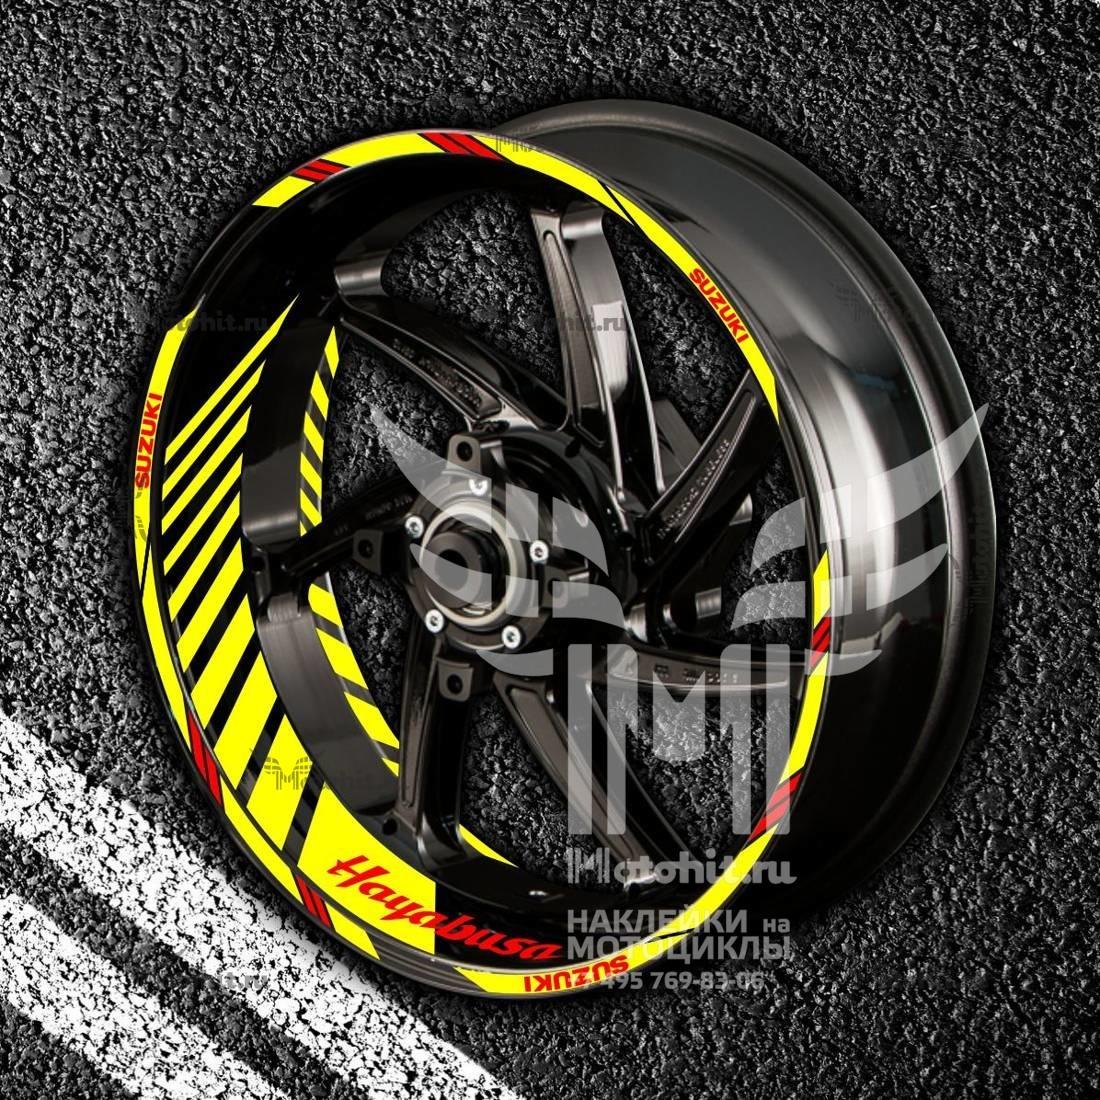 Комплект наклеек с полосами на колеса мотоцикла SUZUKI HAYABUSA